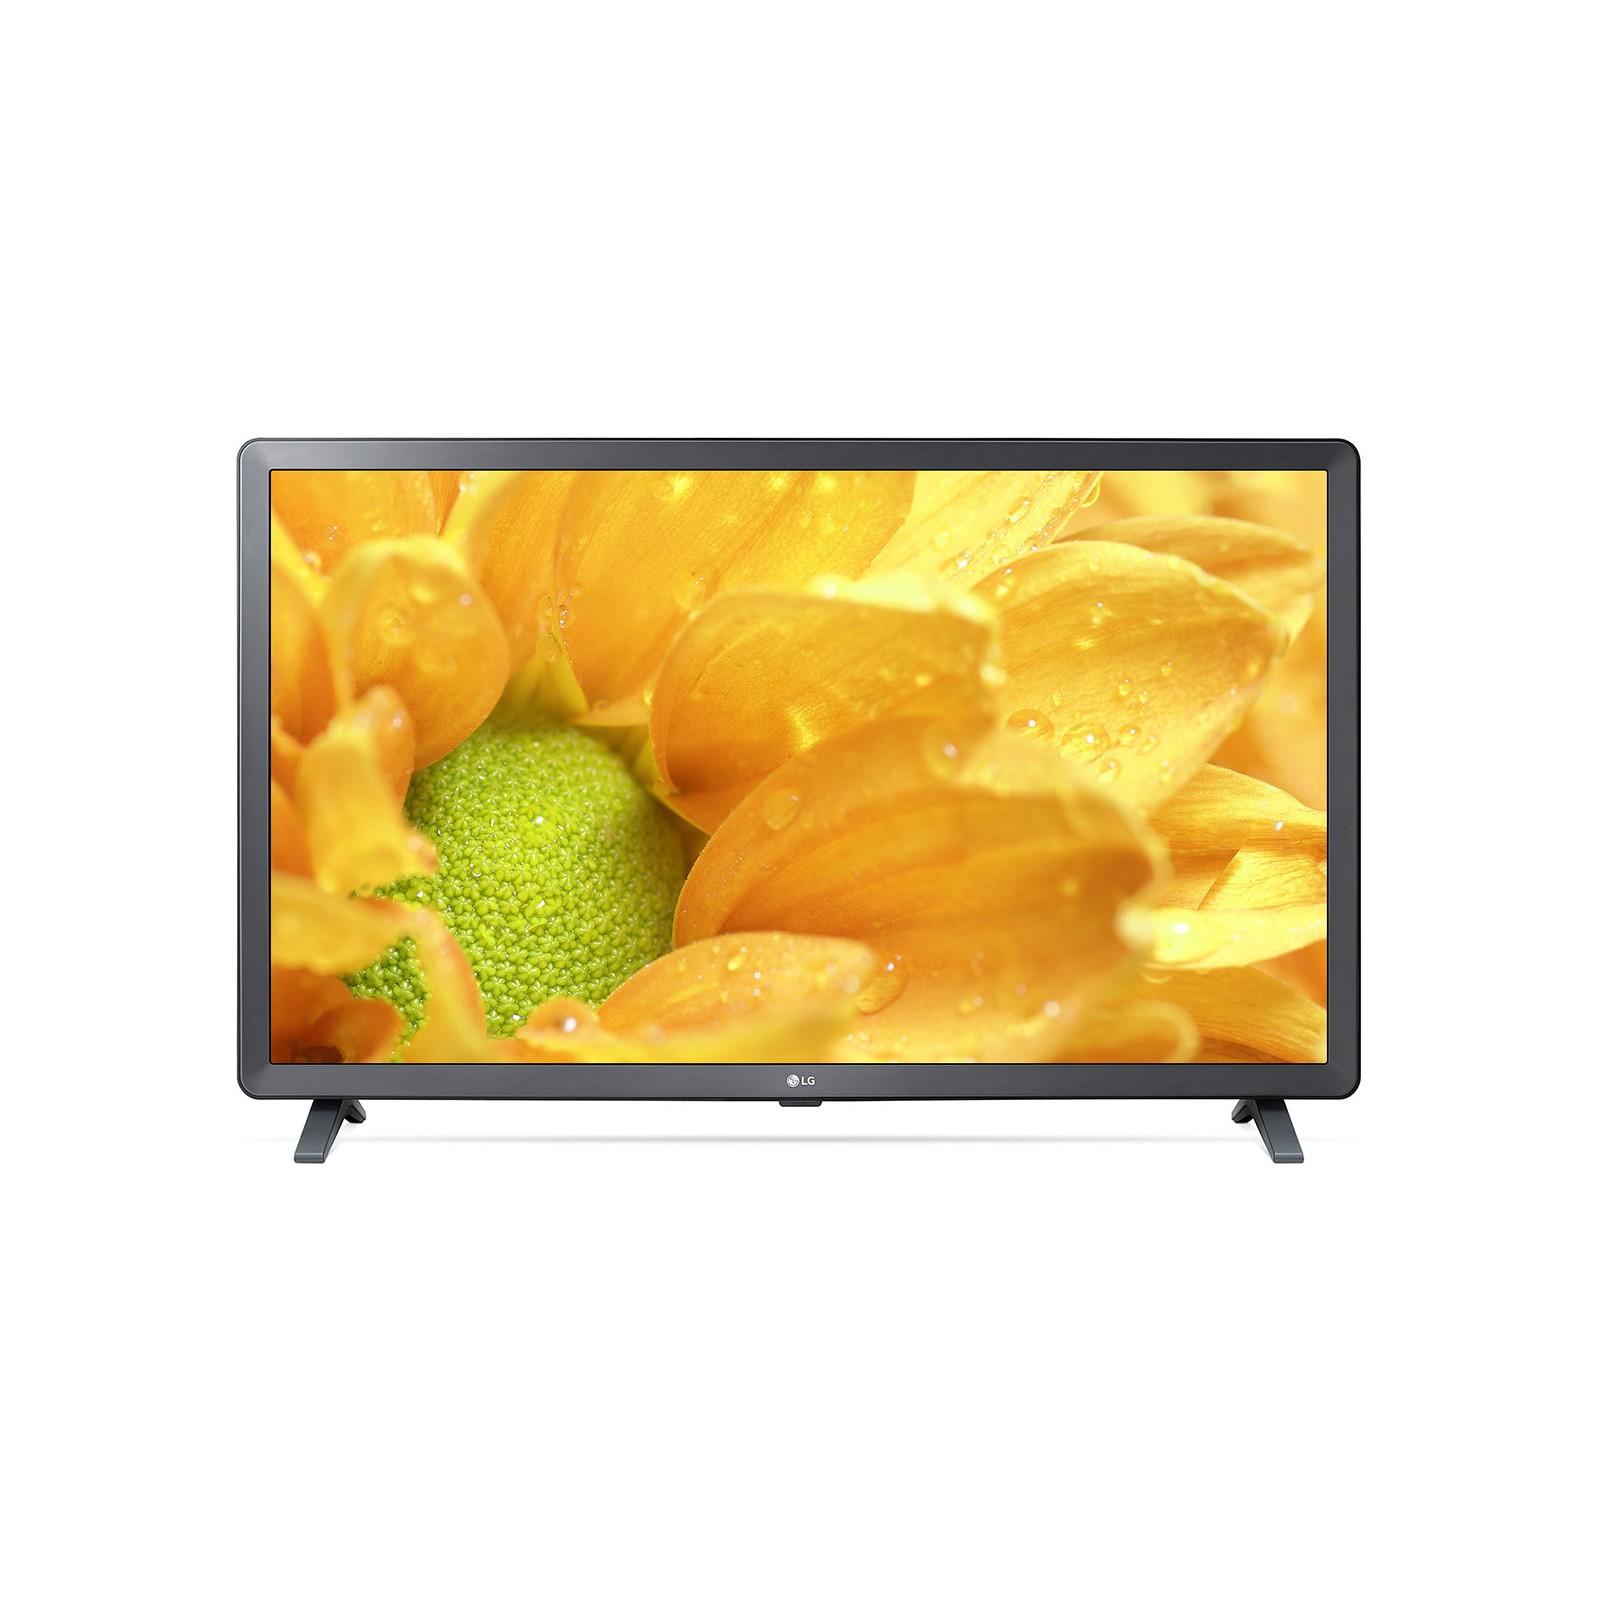 Smart TV LED 32 LG HD 32LM625BPSB - 3 HDMI 2 USB